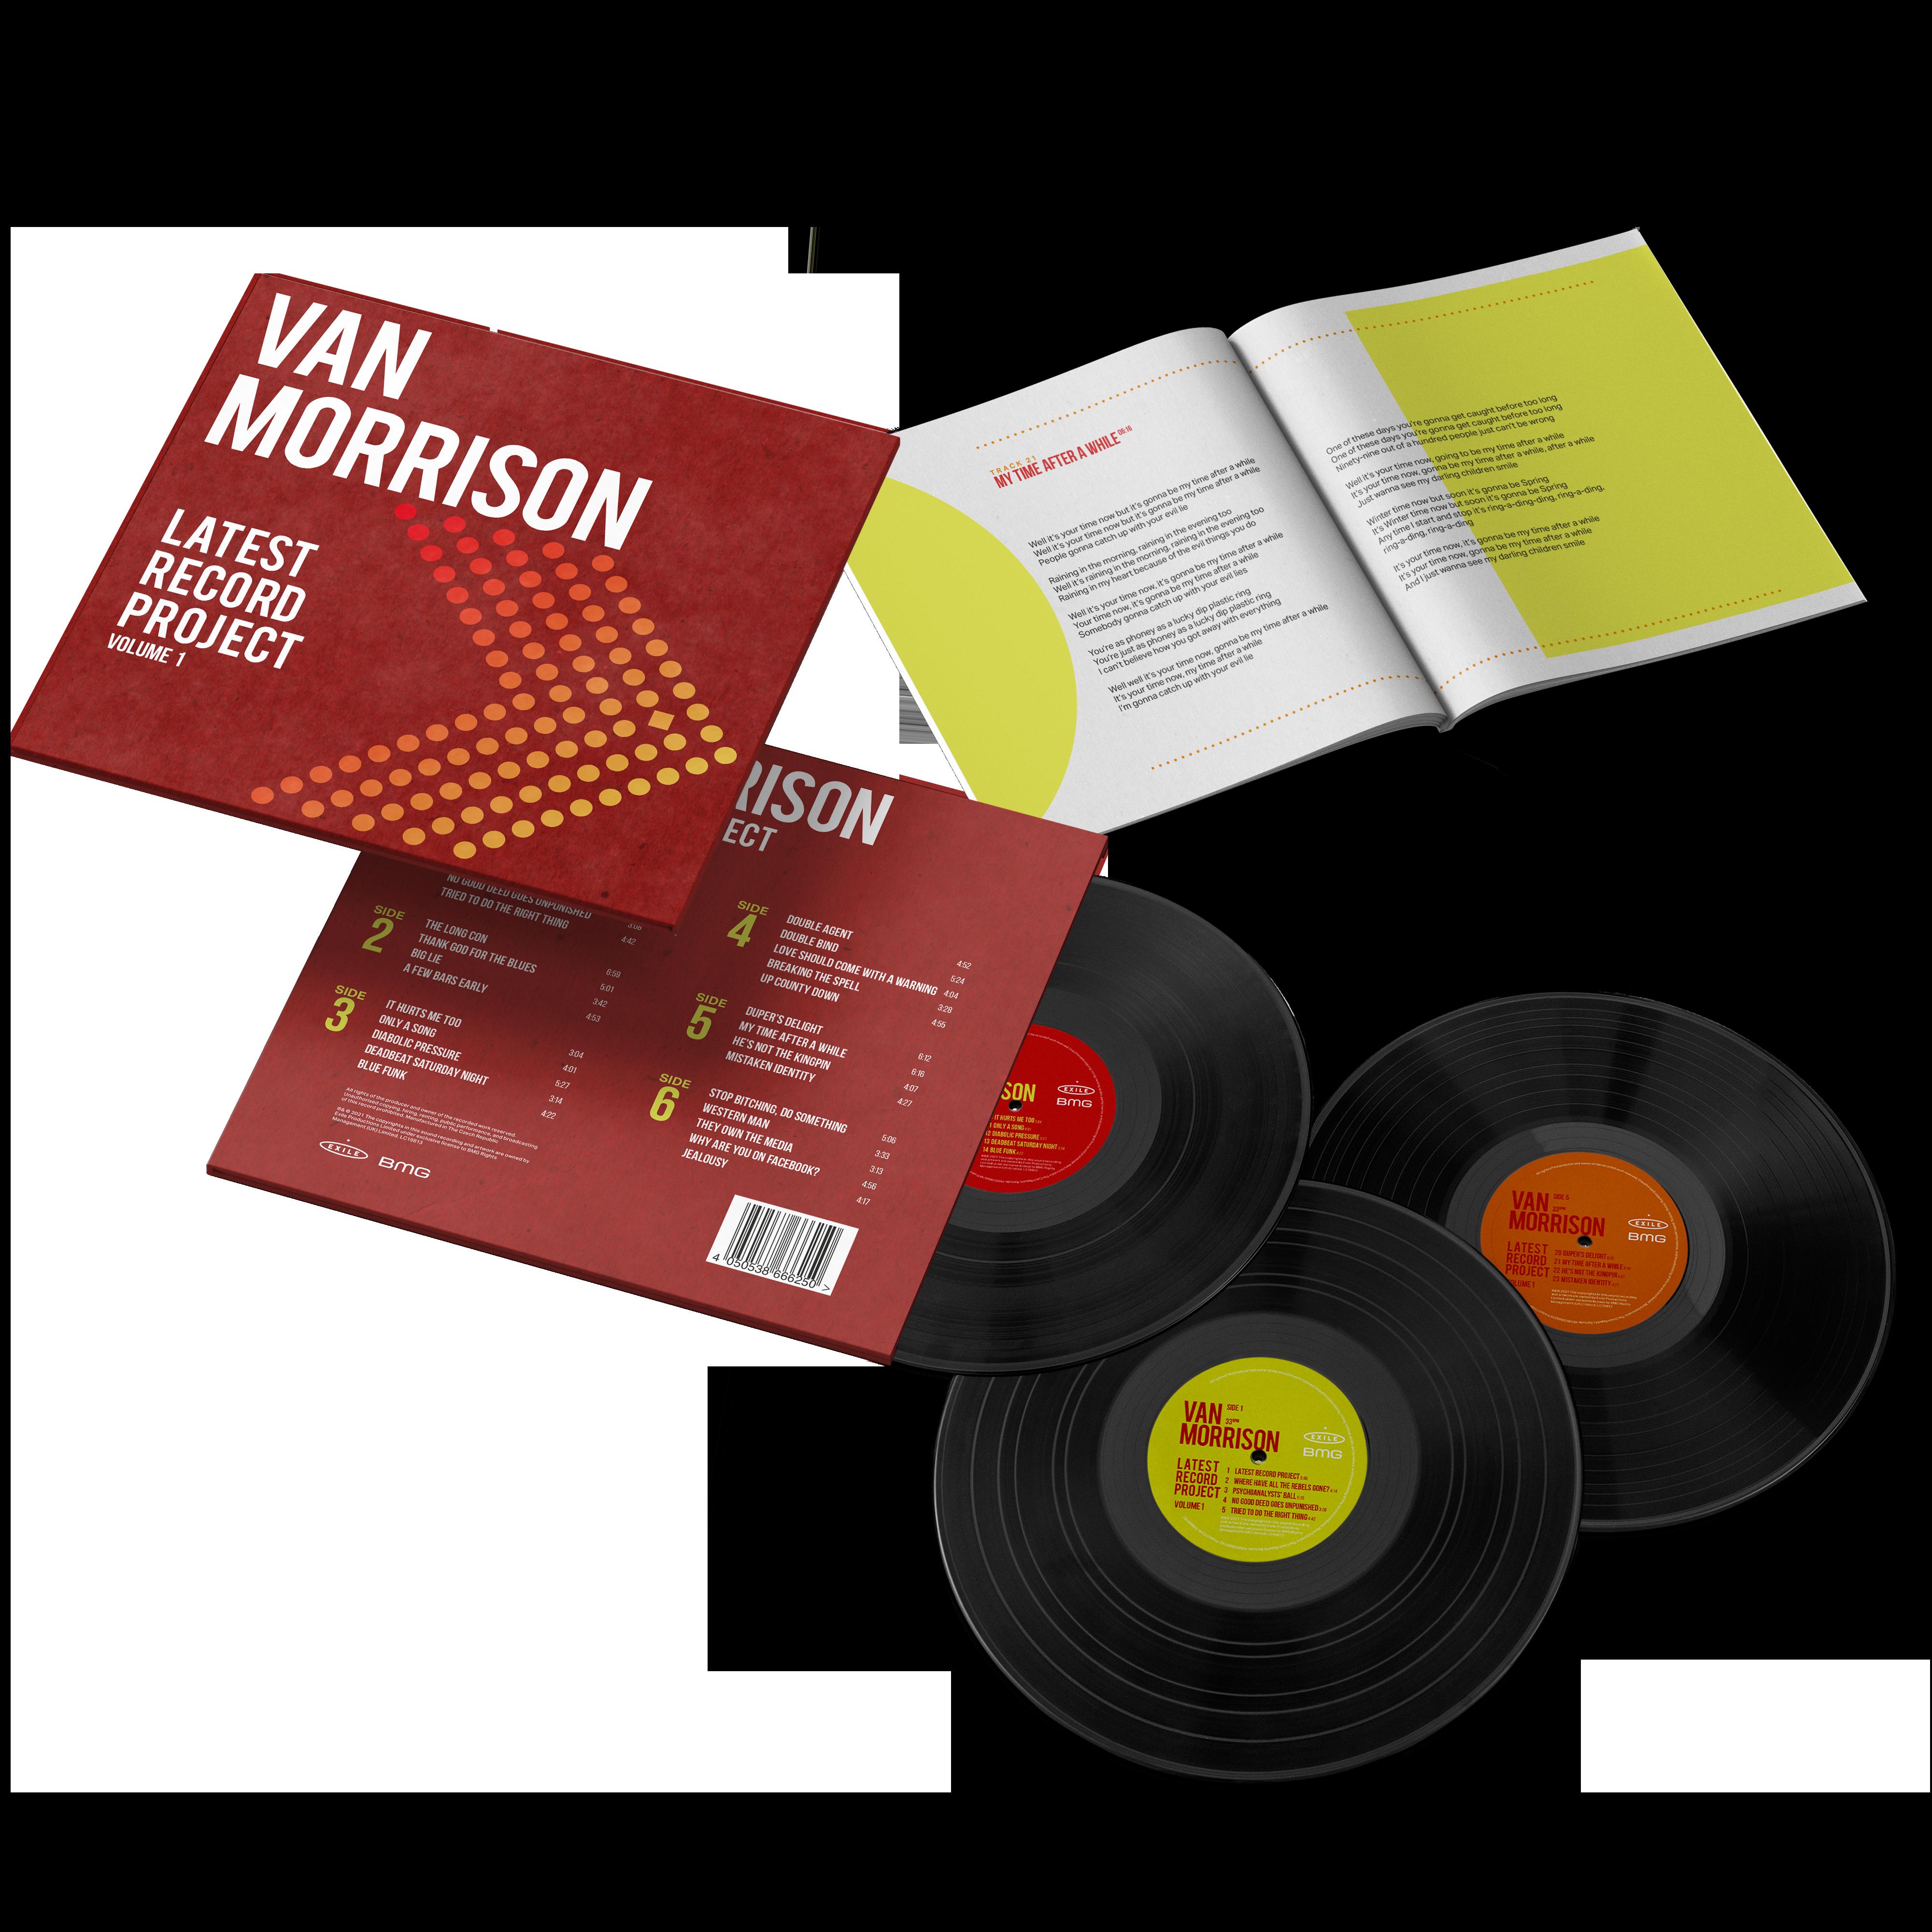 Buy Online Van Morrison - Latest Record Project Volume 1 Standard 3LP